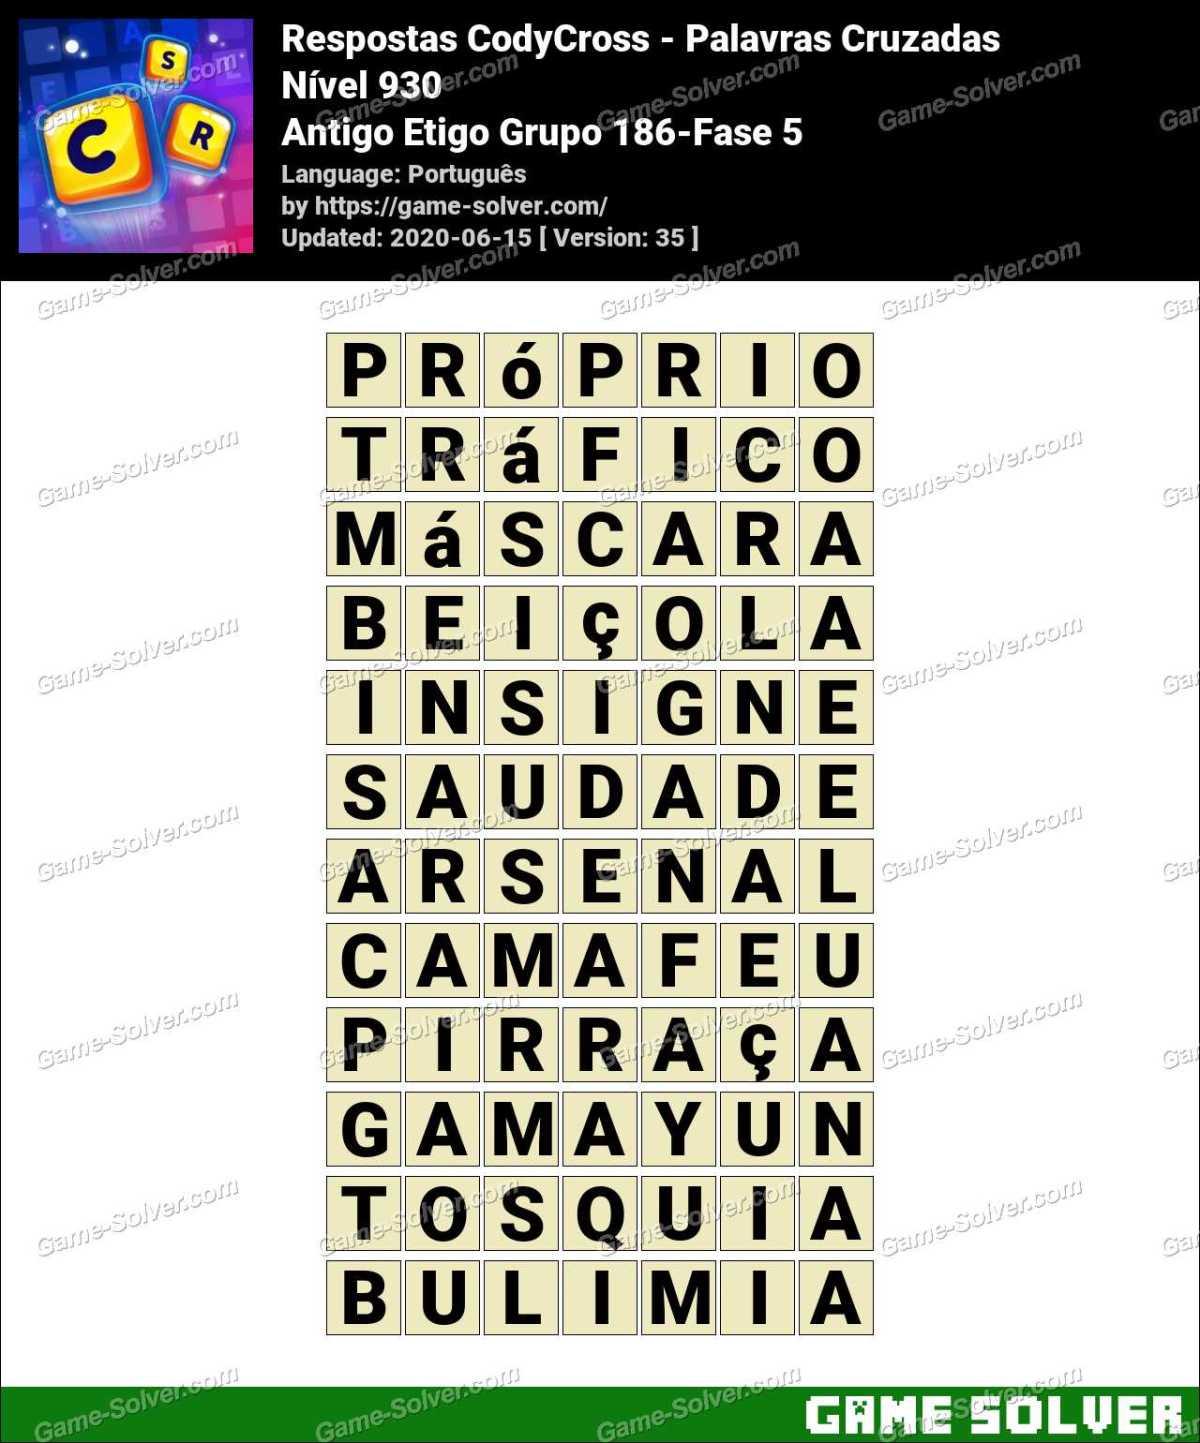 Respostas CodyCross Antigo Etigo Grupo 186-Fase 5